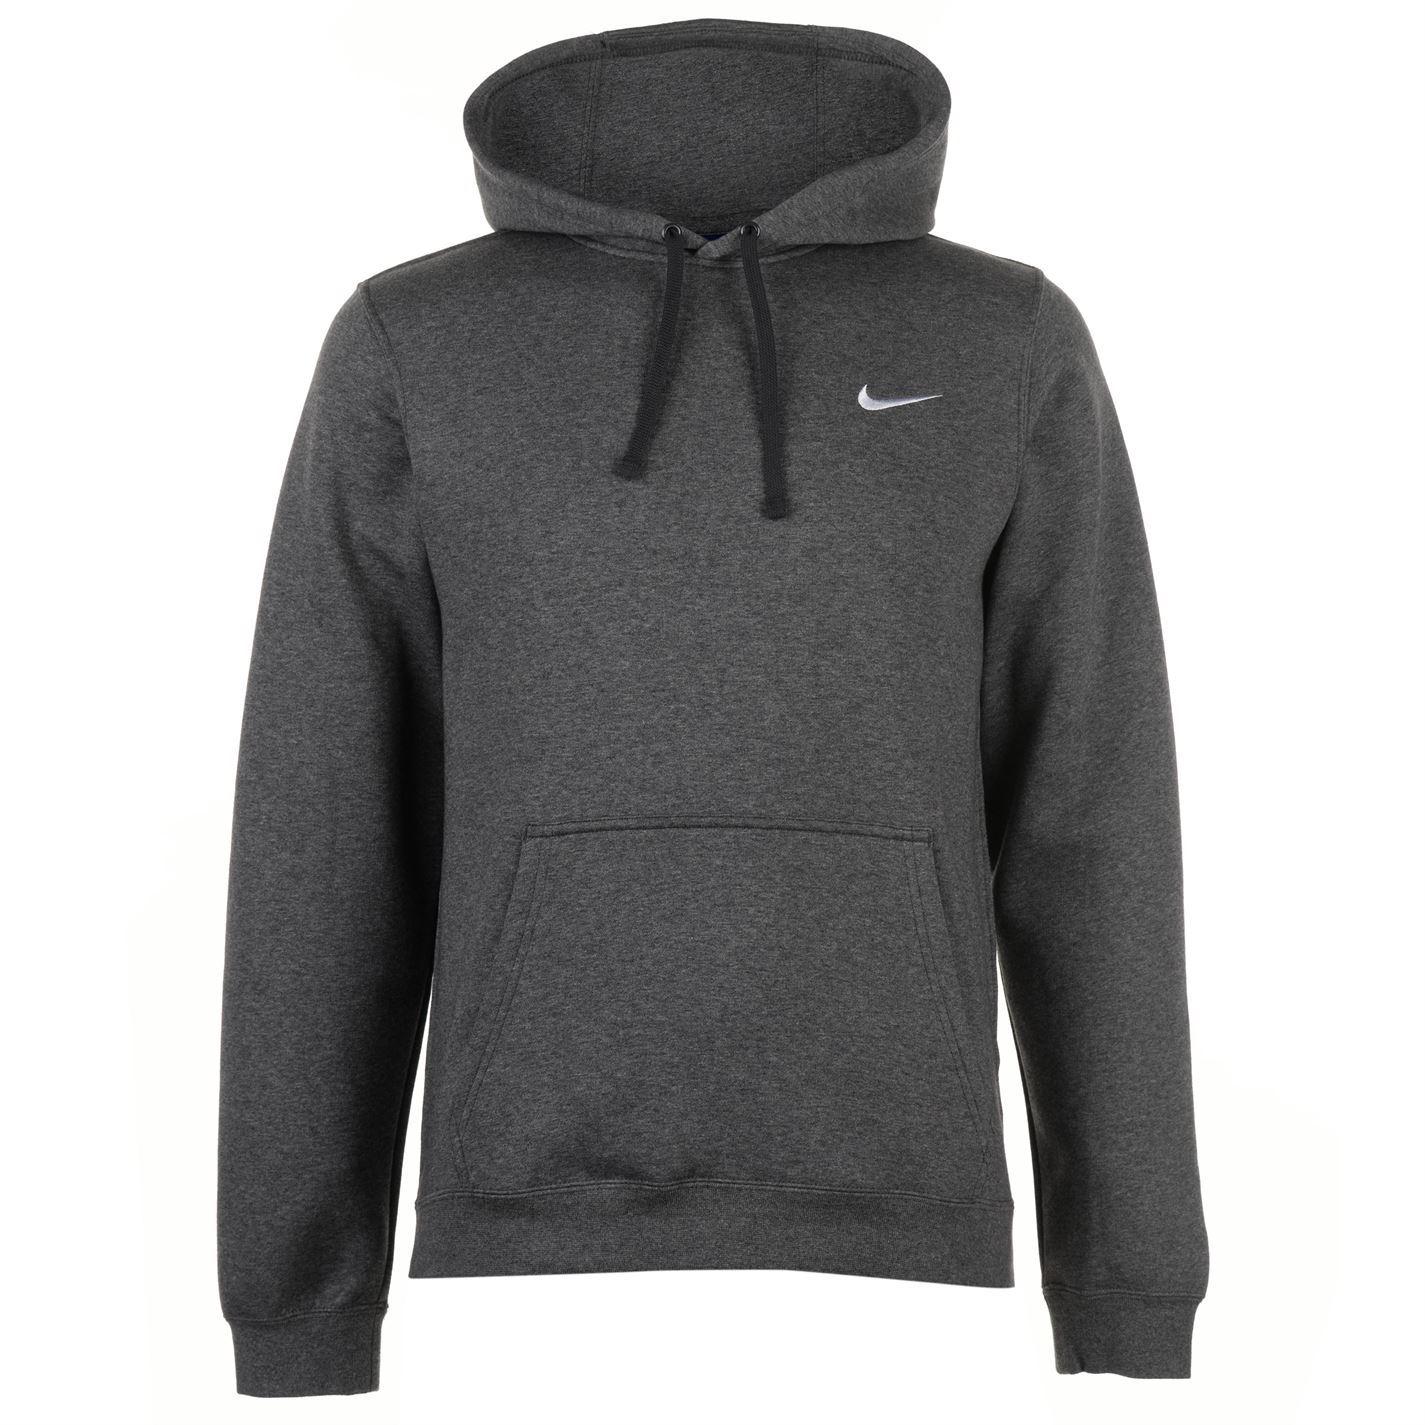 Nike-Fundamentals-Fleece-Lined-Pullover-Hoody-Mens-OTH-Hoodie-Sweatshirt-Sweater thumbnail 14